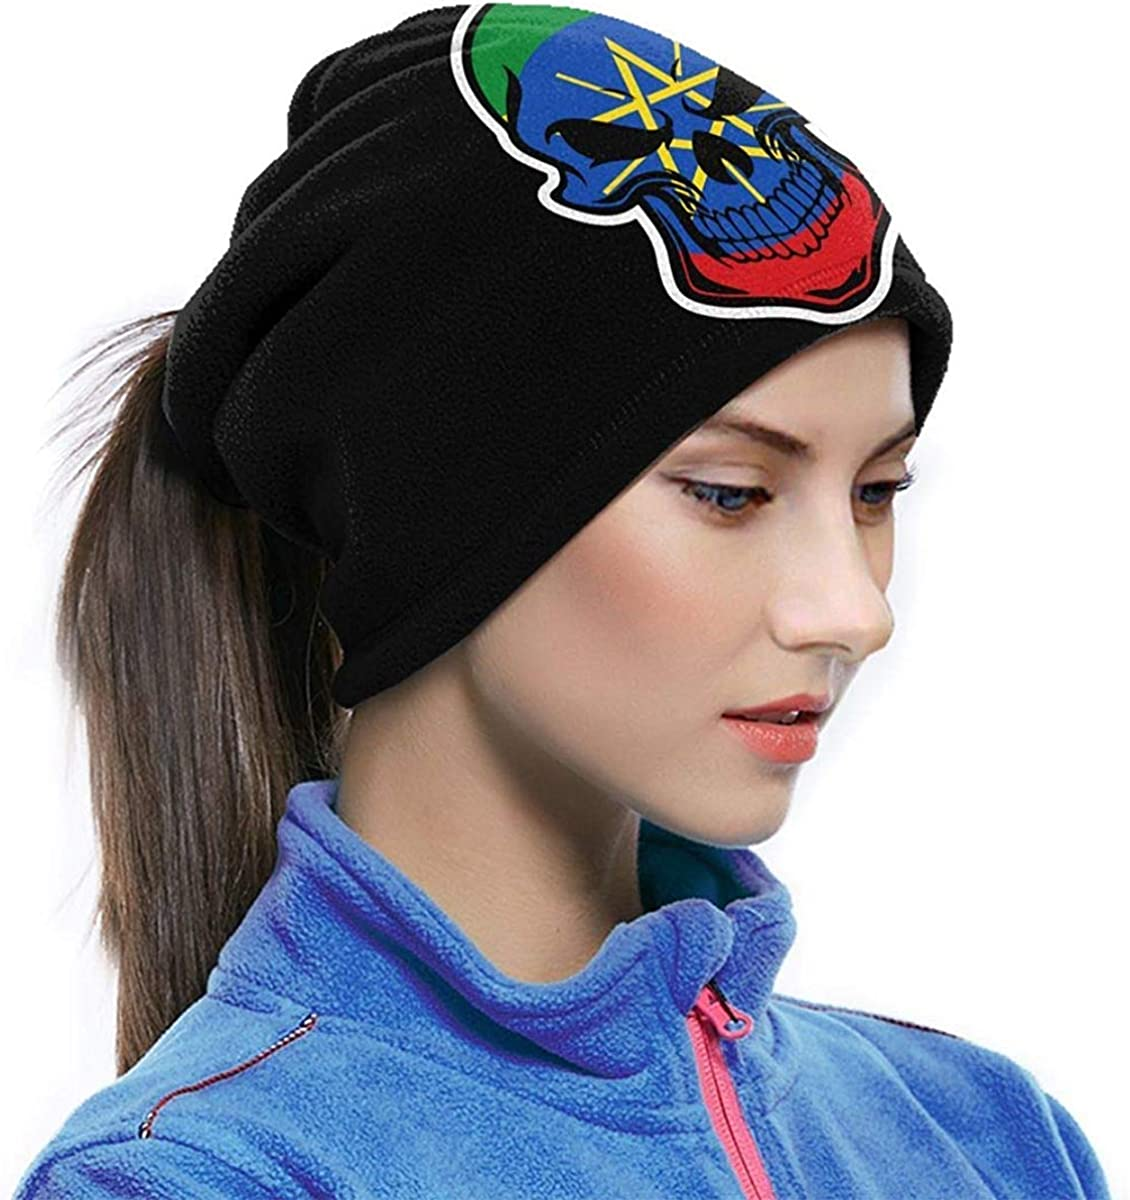 Ethiopian Flag Skull Microfiber Neck Warmer Balaclavas Soft Fleece Headwear Face Scarf Mask For Winter One Size